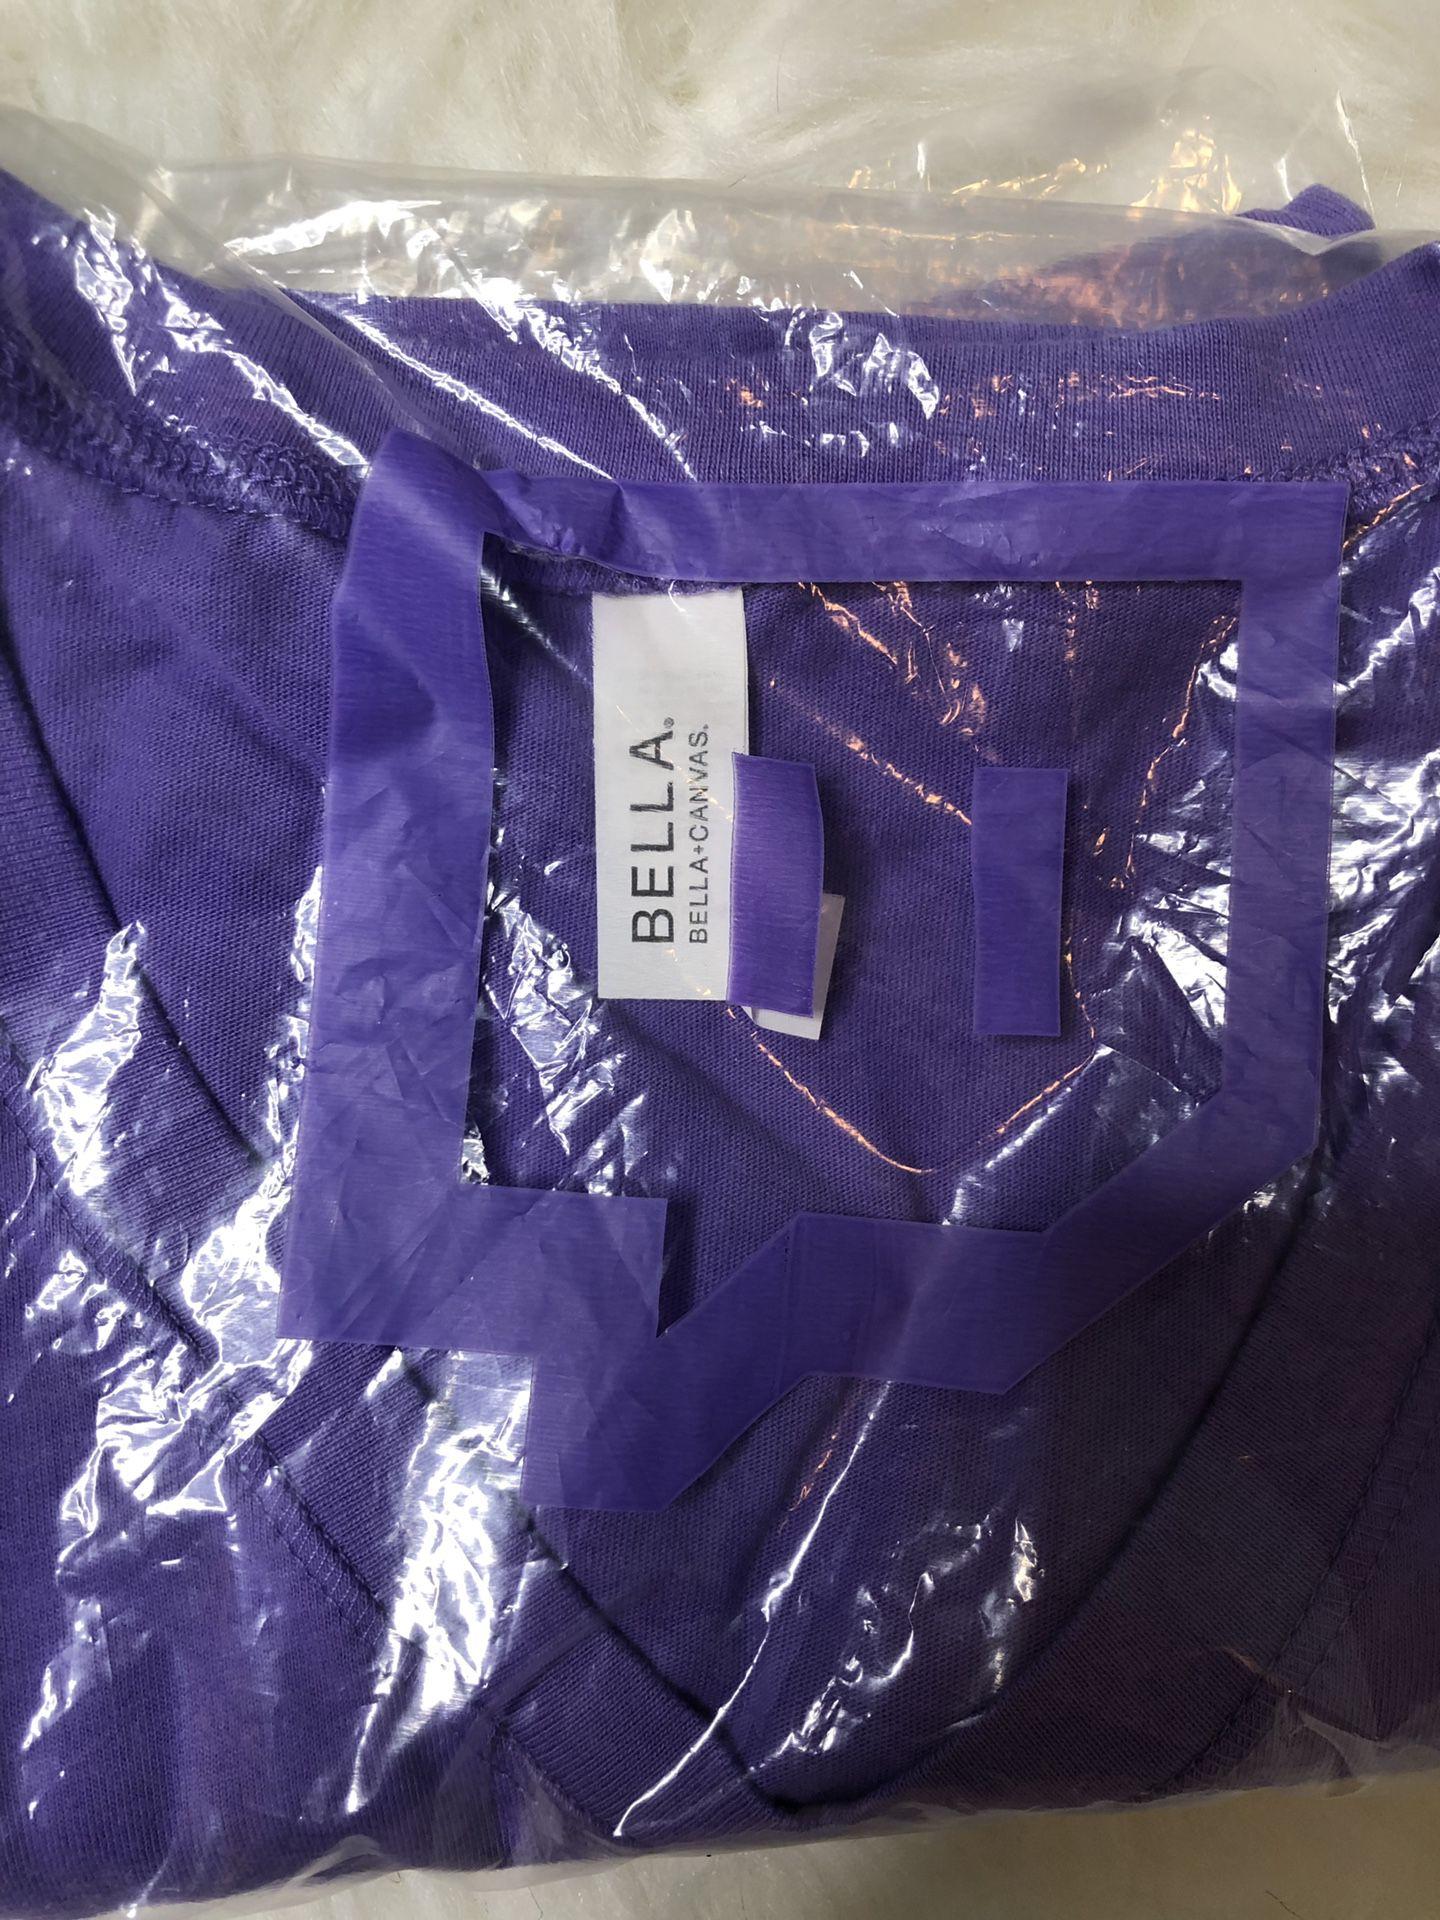 Twitch Purple V-Neck T-shirt Womens Girls Online Gamer Glitch Small